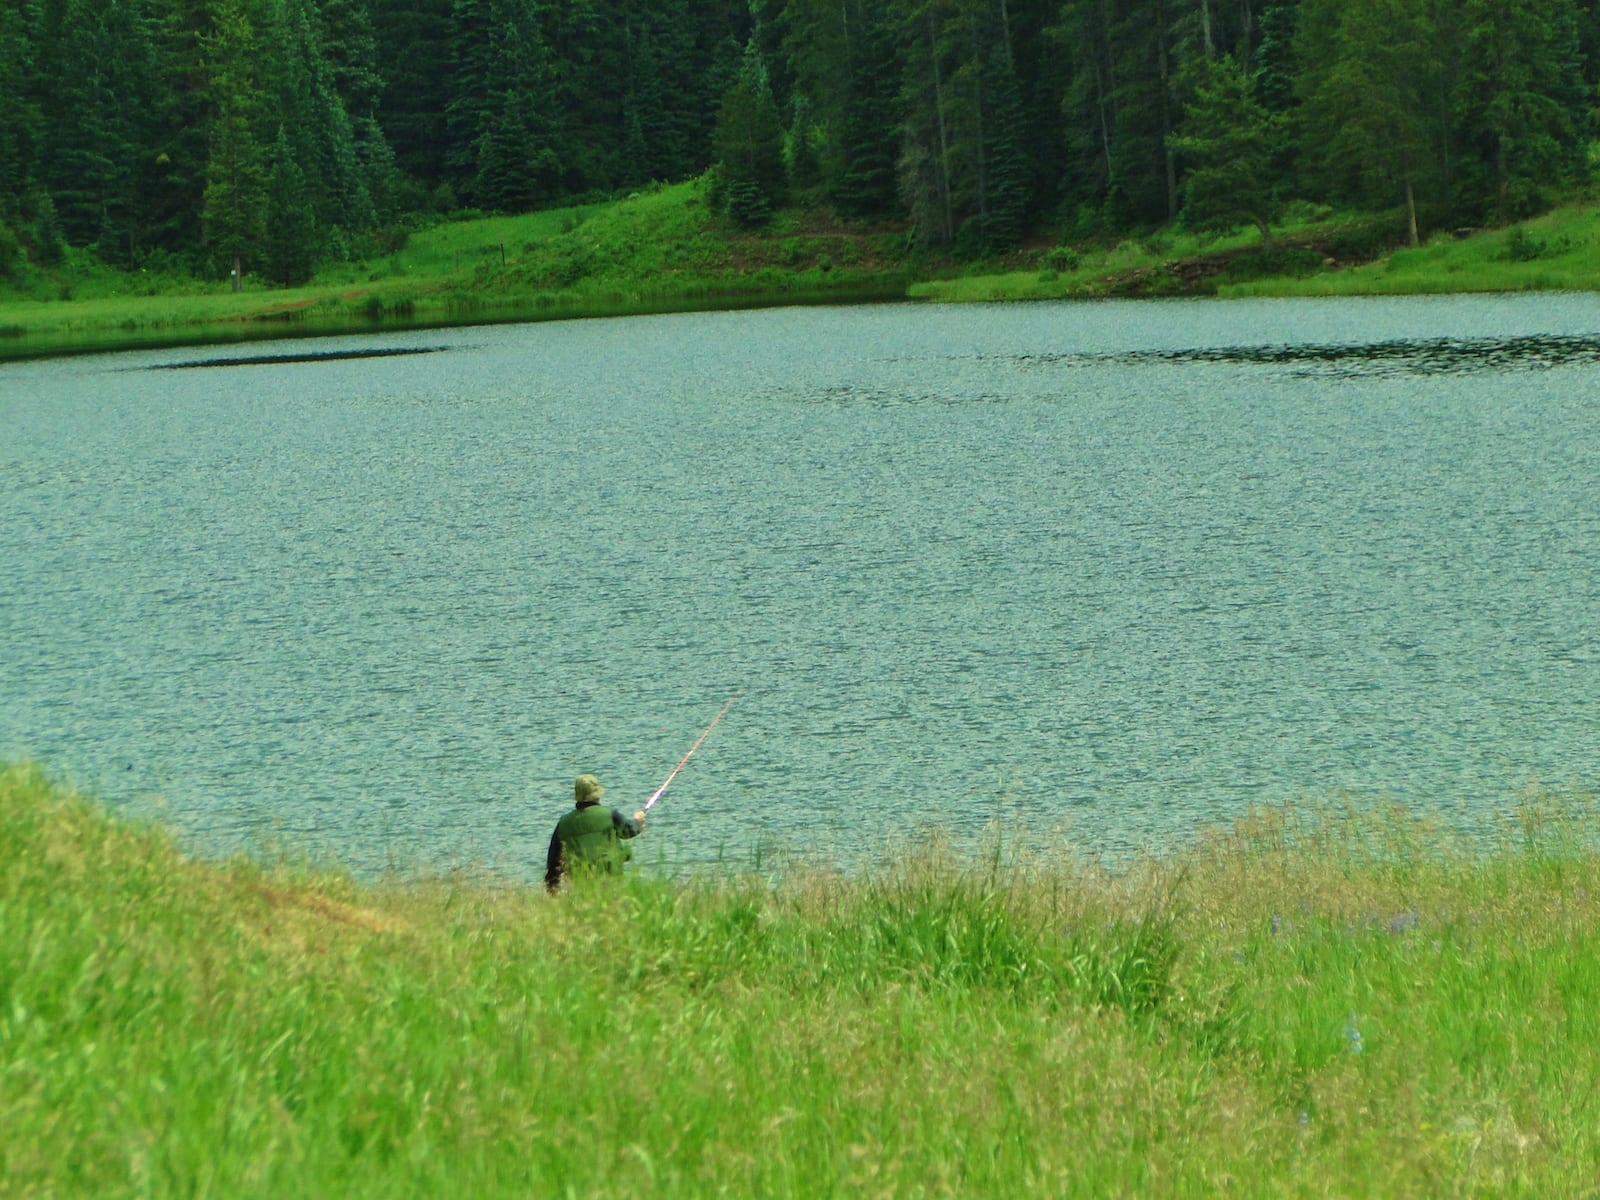 Sylvan Lake Eagle CO Fisherman Casting Line